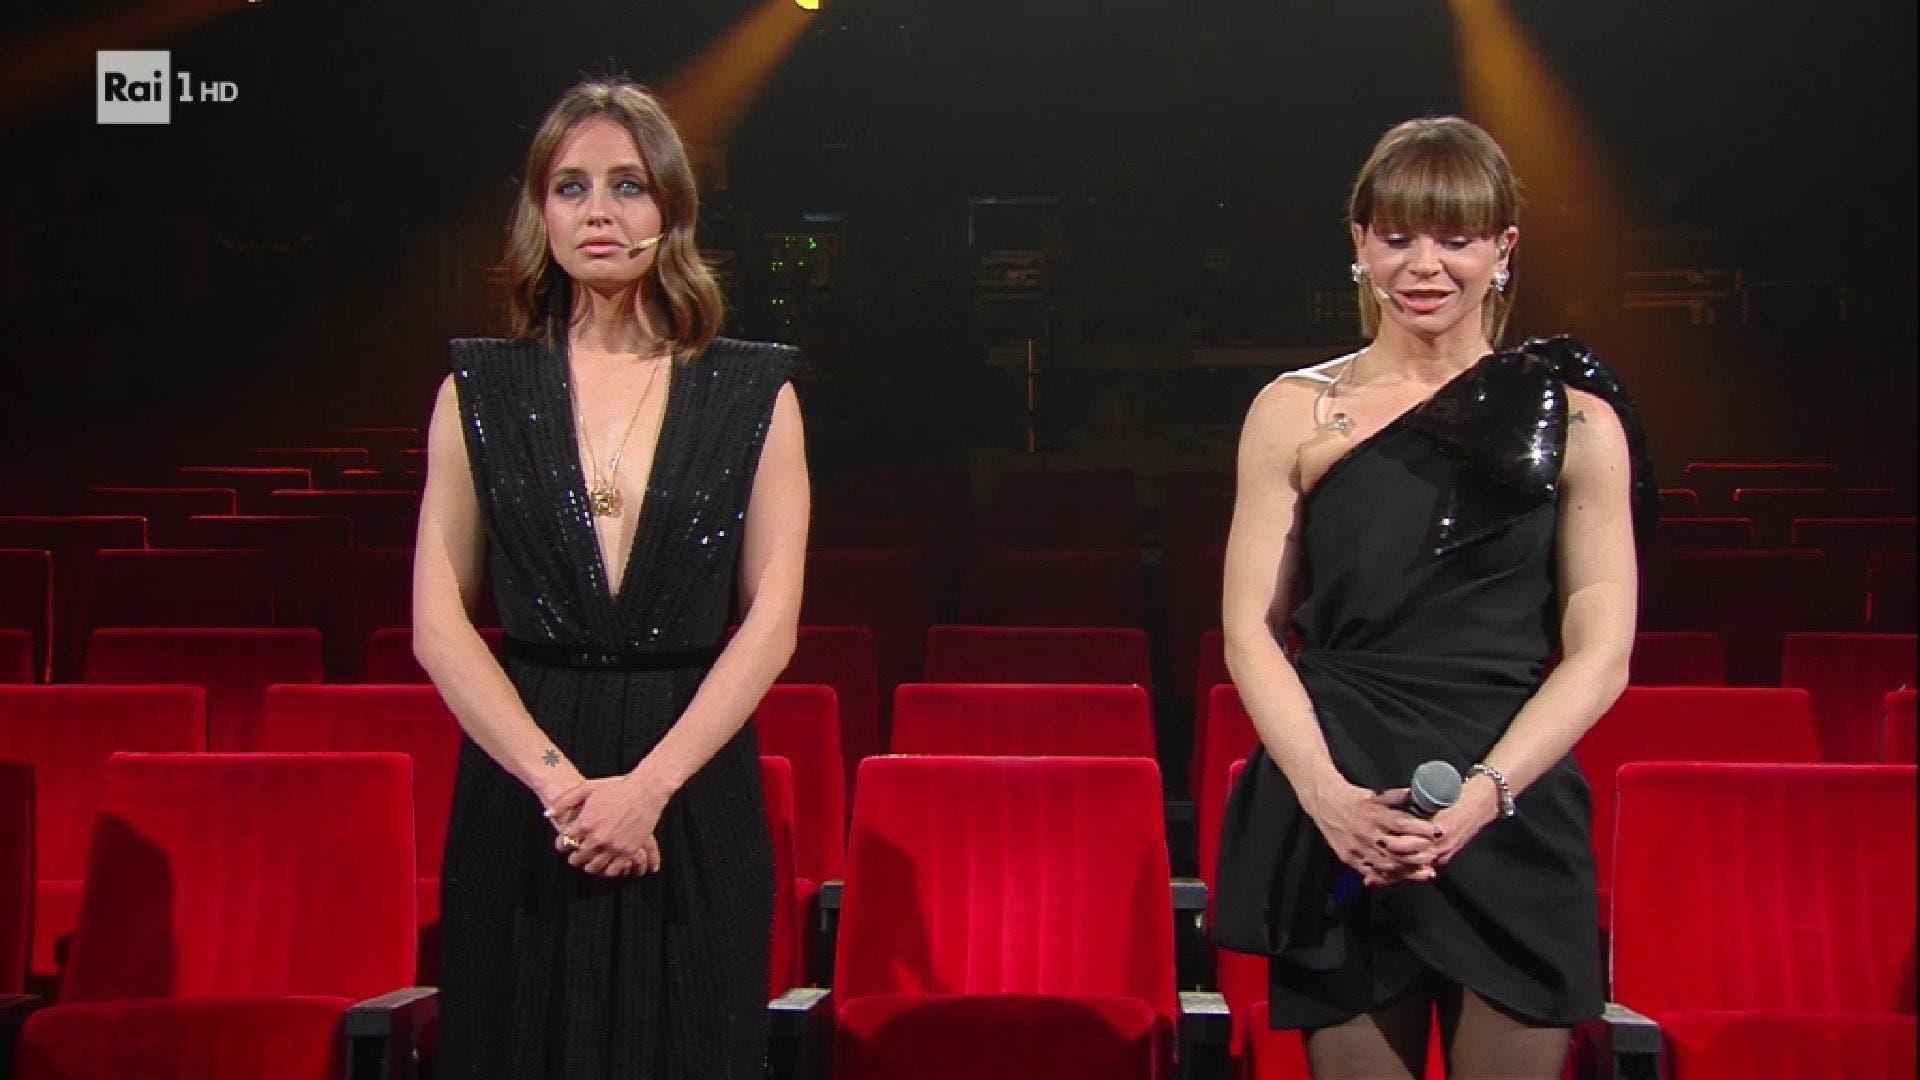 Matilde Gioli e Alessandra Amoroso - Quarta serata Sanremo 2021 (da RaiPlay)